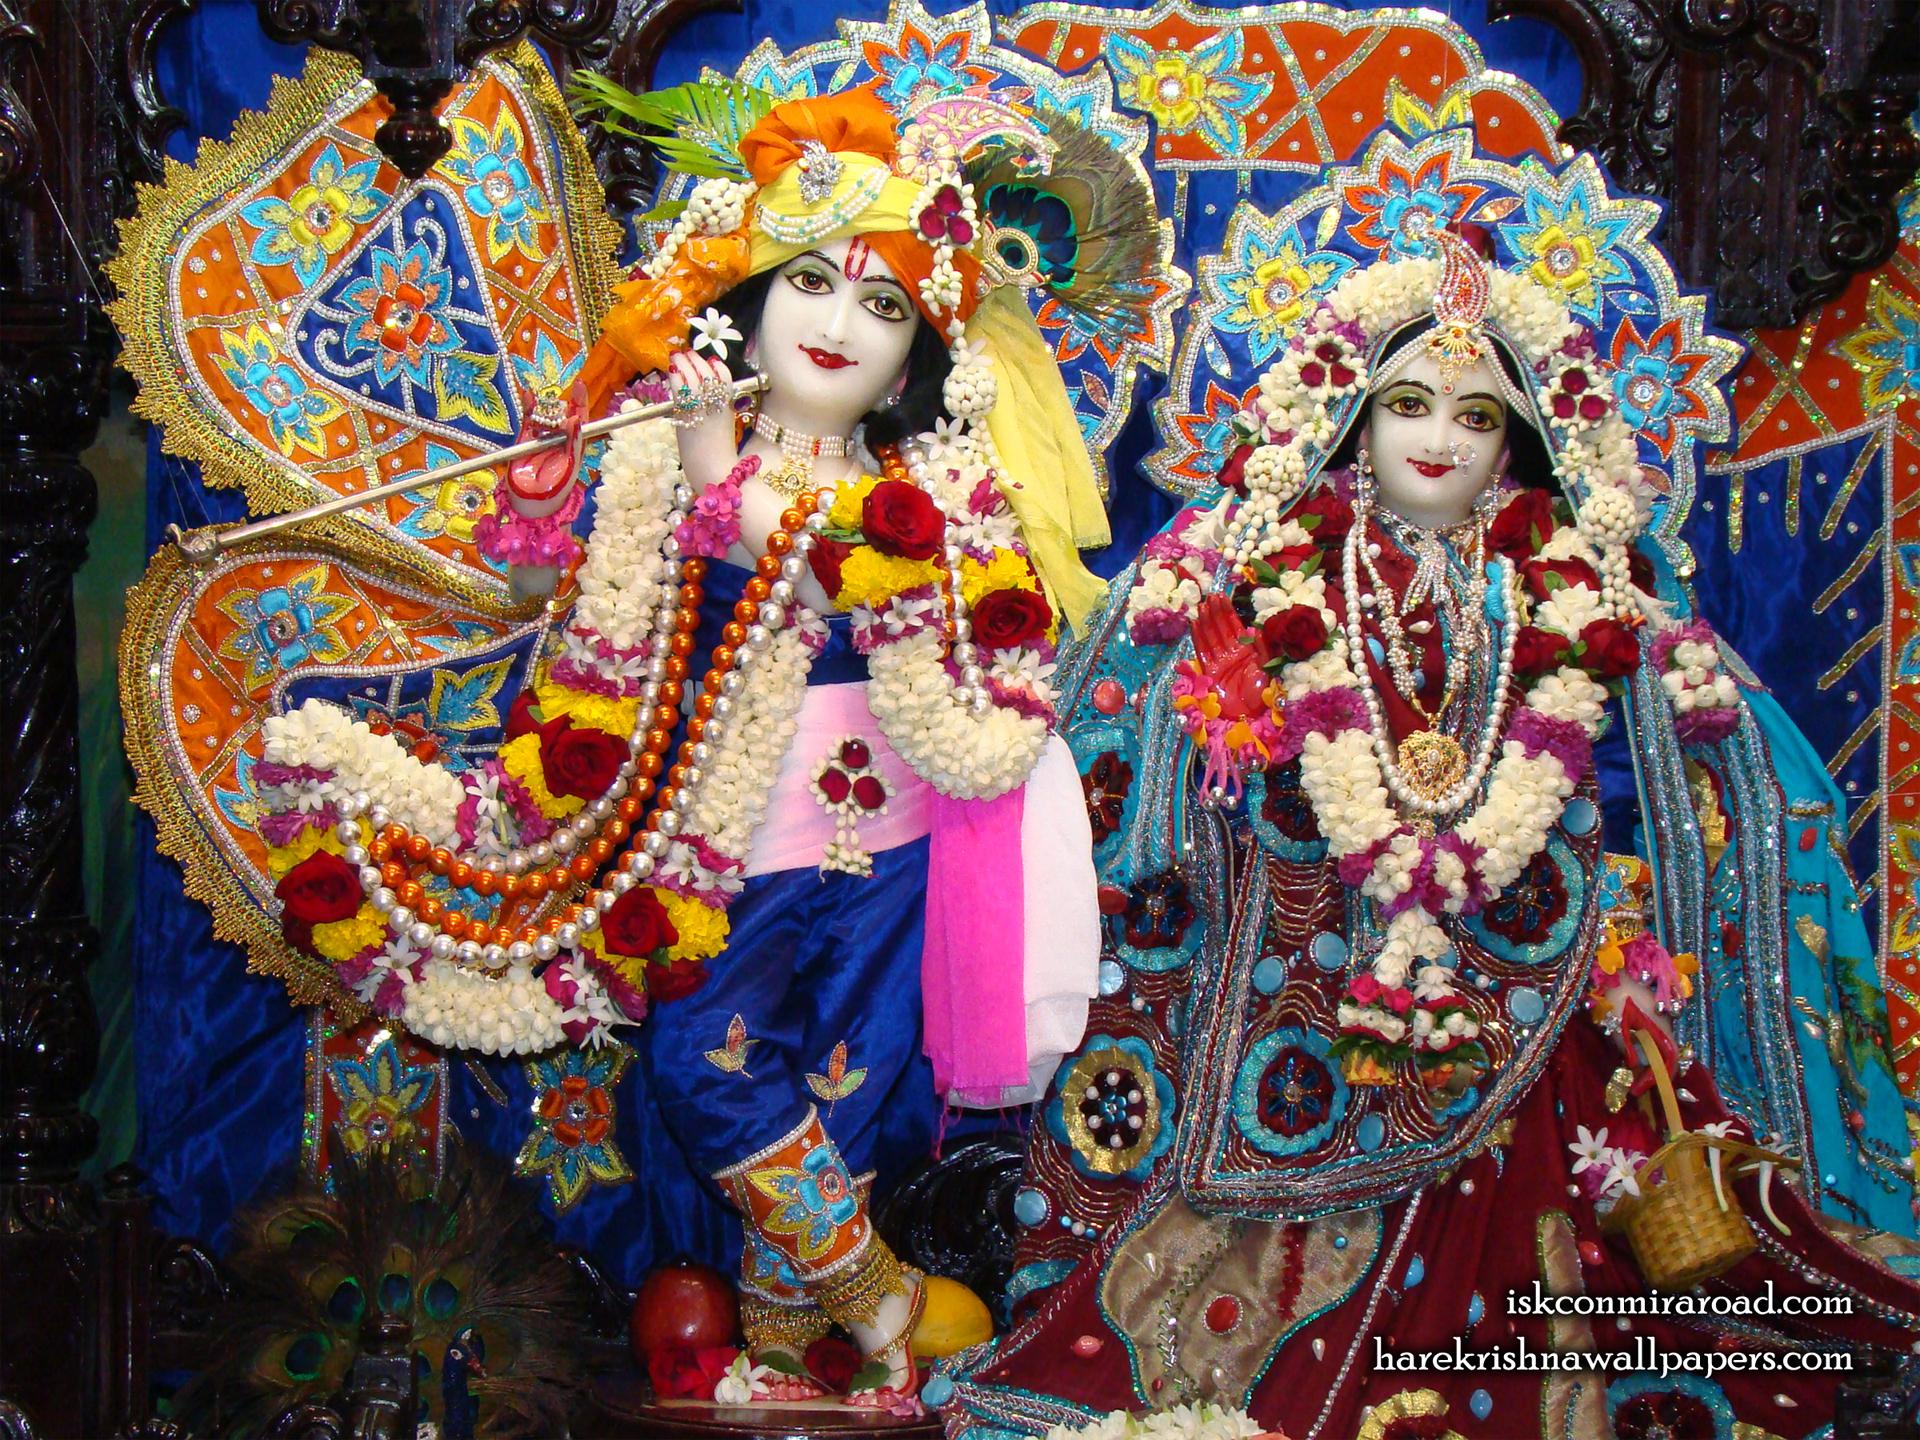 Sri Sri Radha Giridhari Wallpaper (018) Size 1920x1440 Download